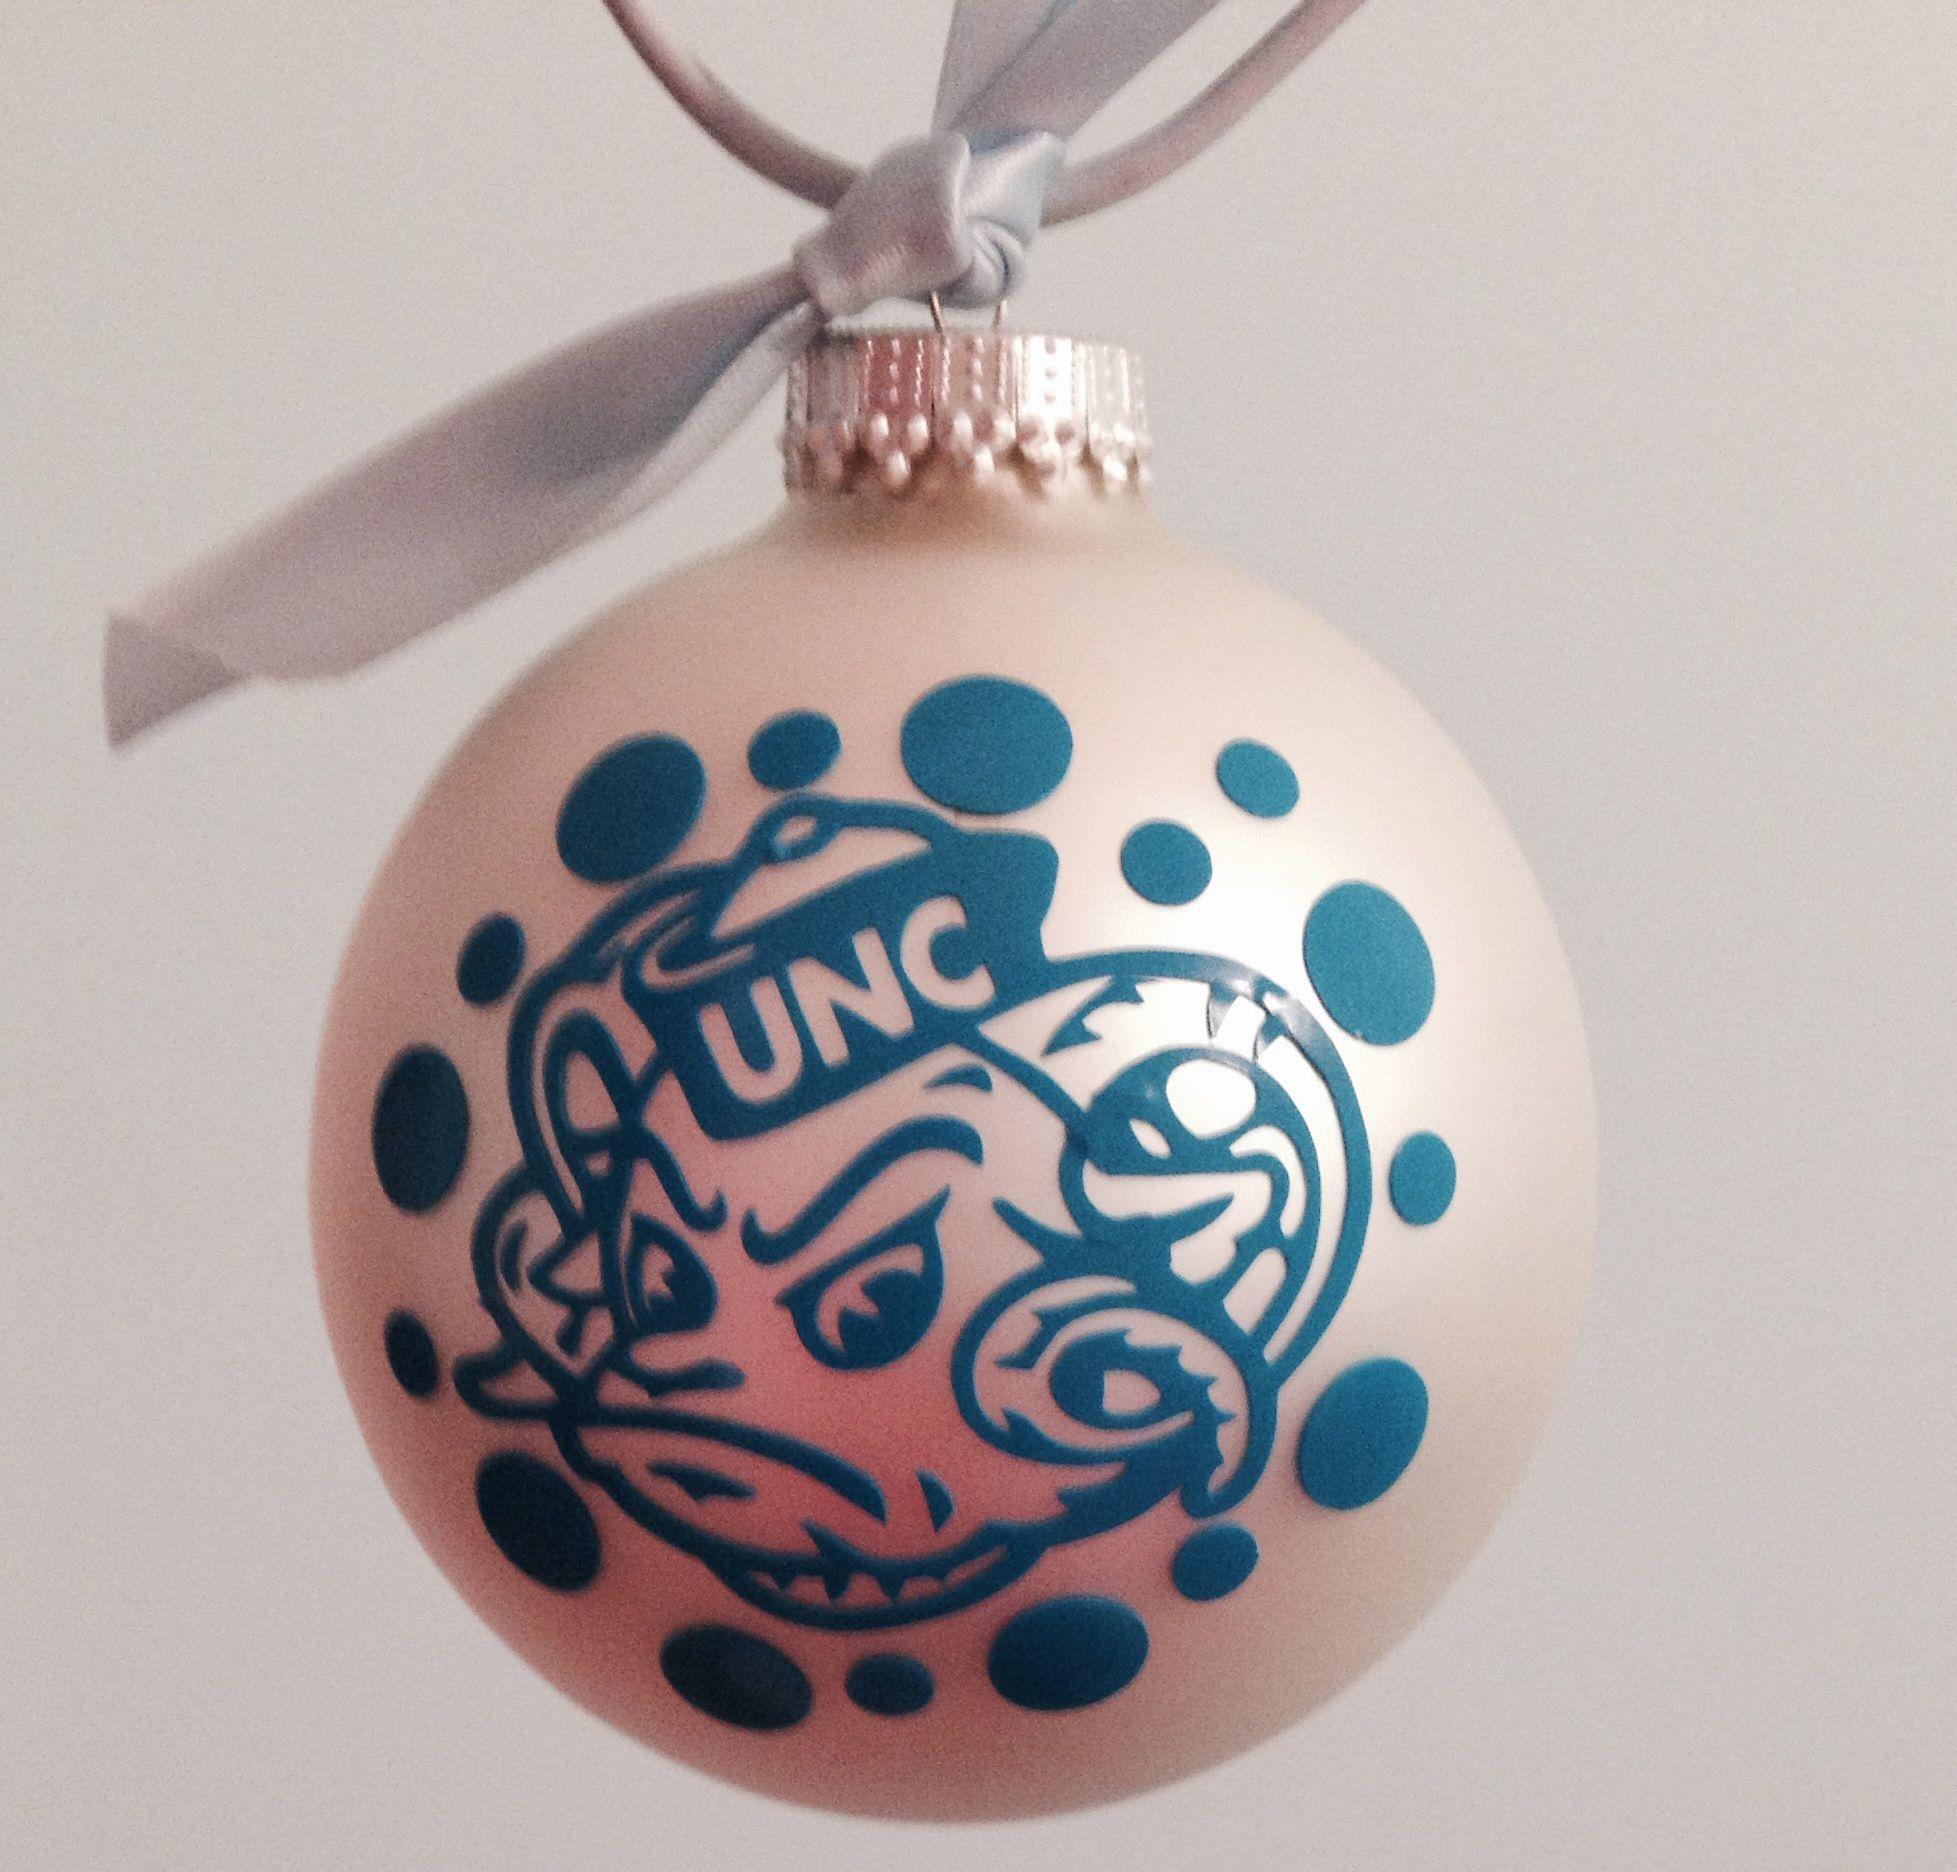 Tarheel Christmas Ornament #UNC | Items I created! | Pinterest | Unc ...